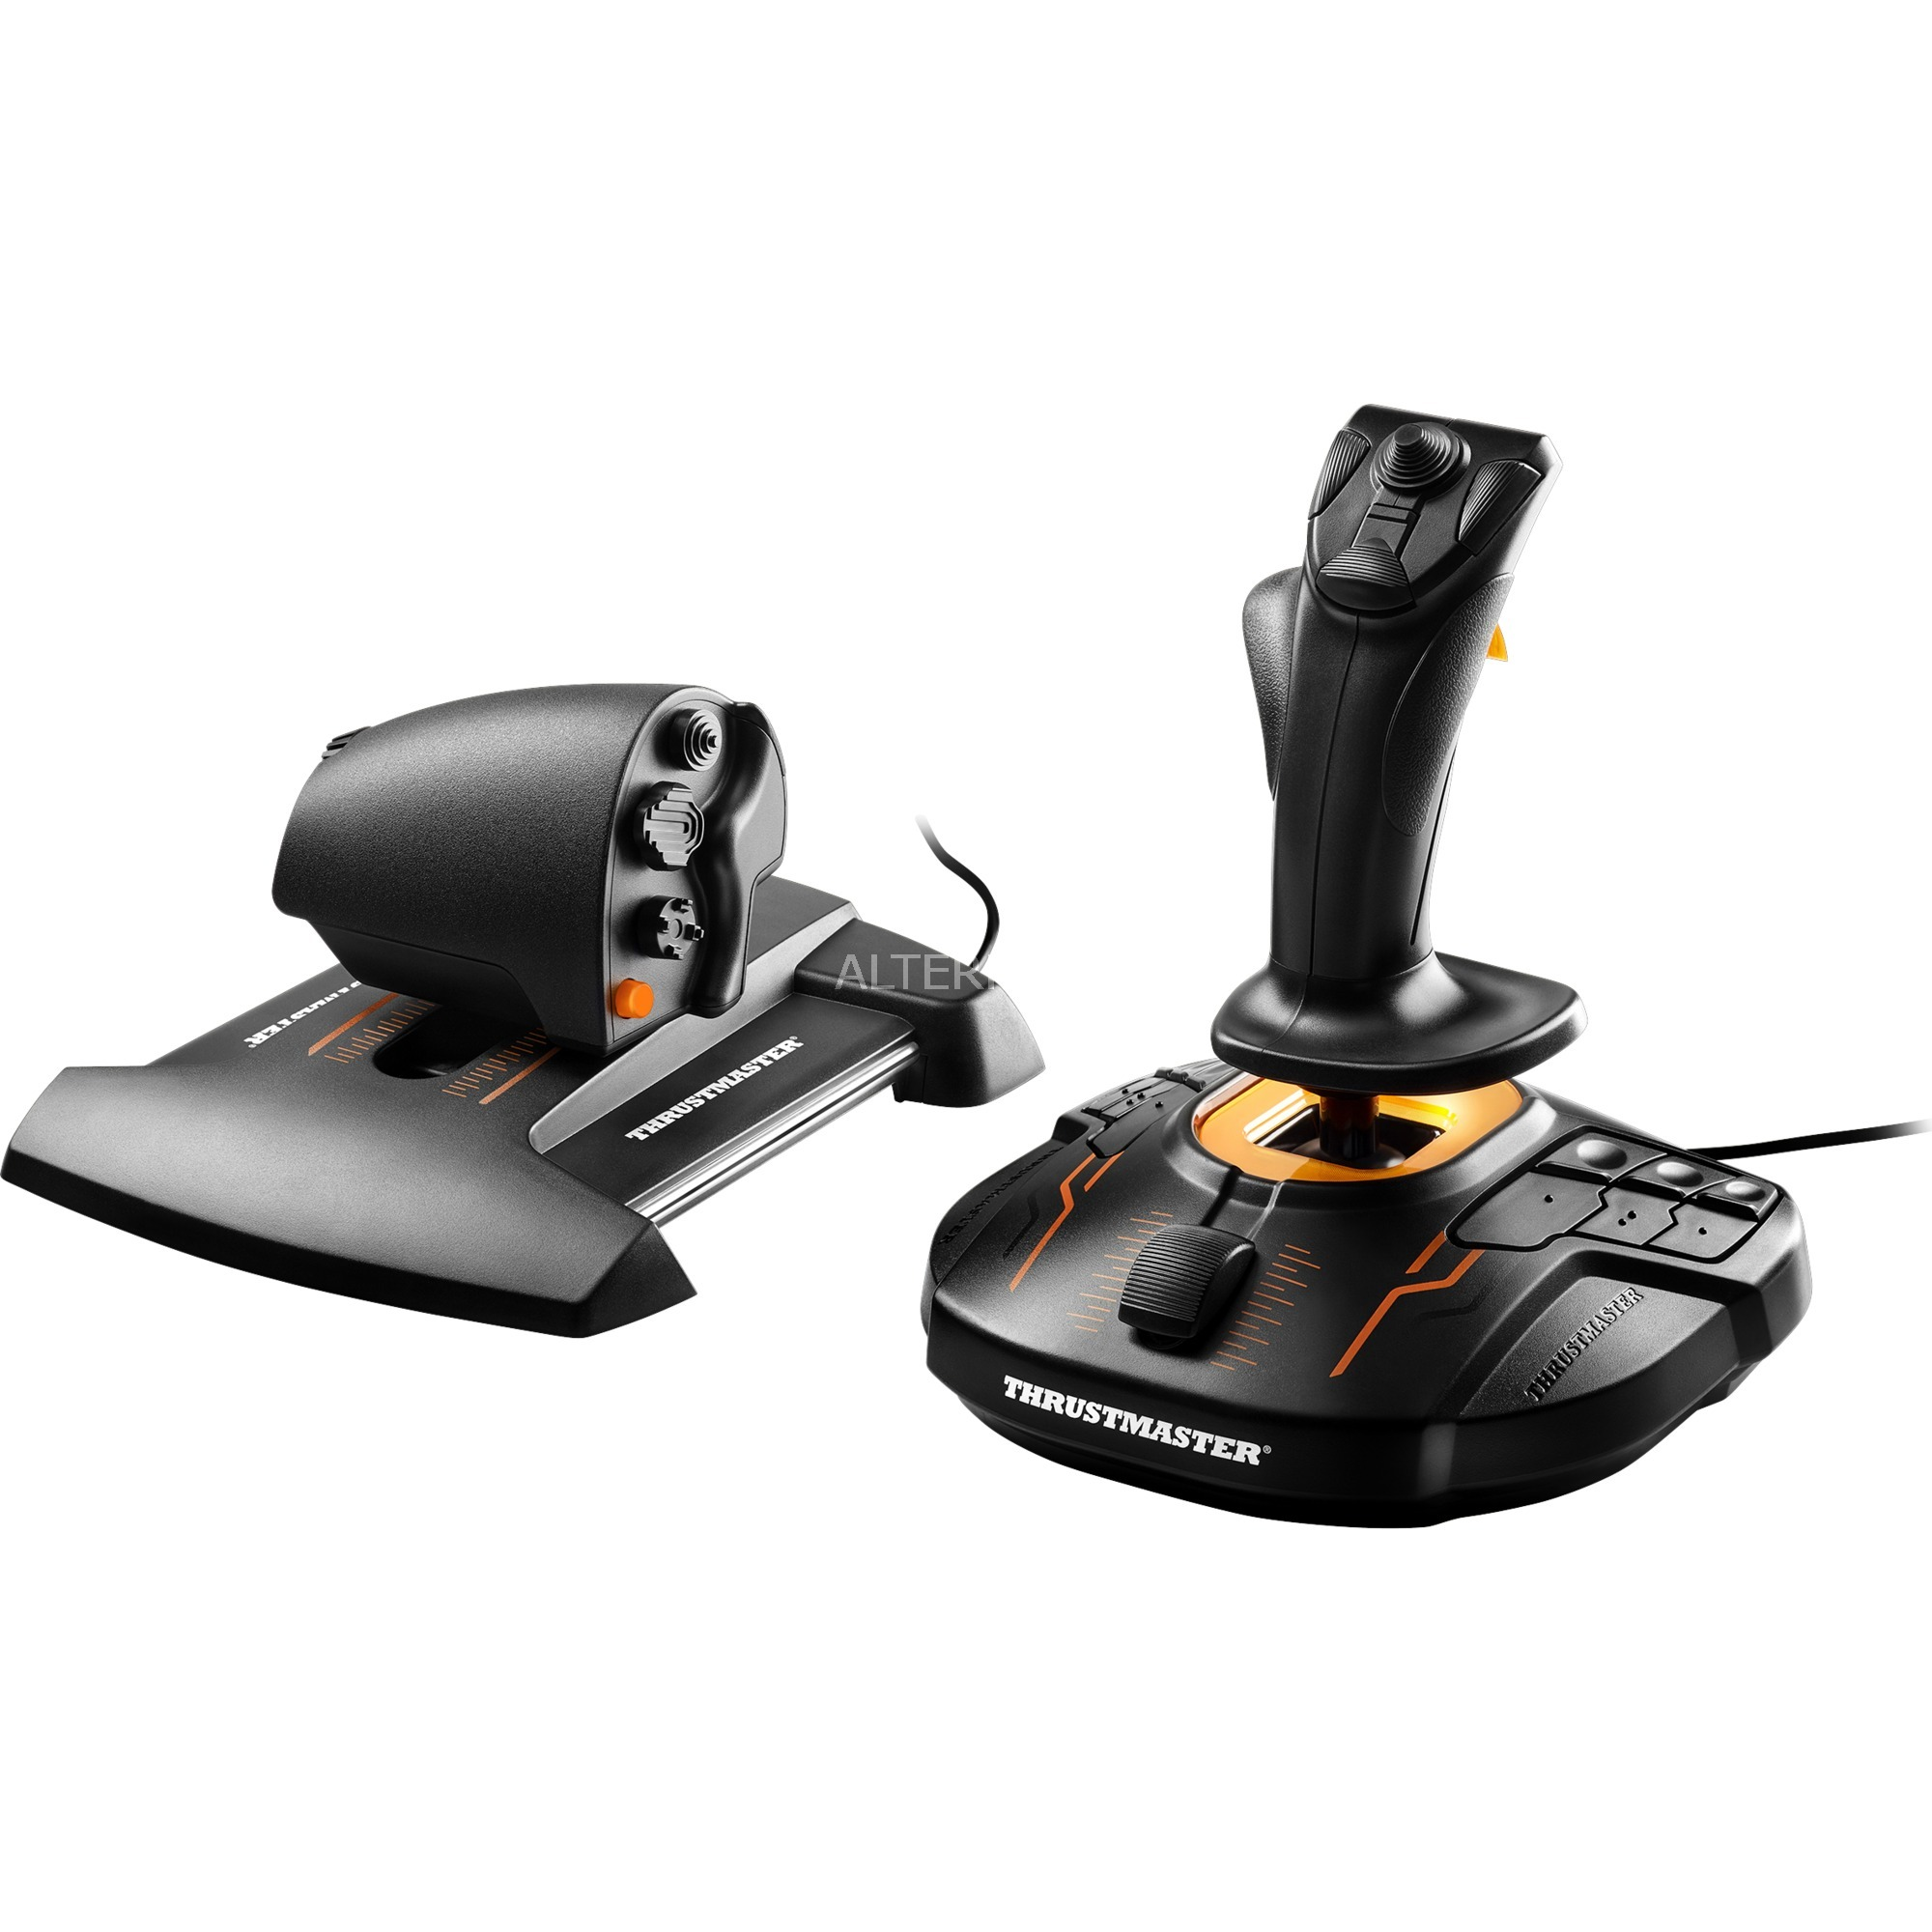 T.16000M FCS Hotas Palanca de mando Mac,PC Negro, Naranja, Hotas (mando más palanca de control)